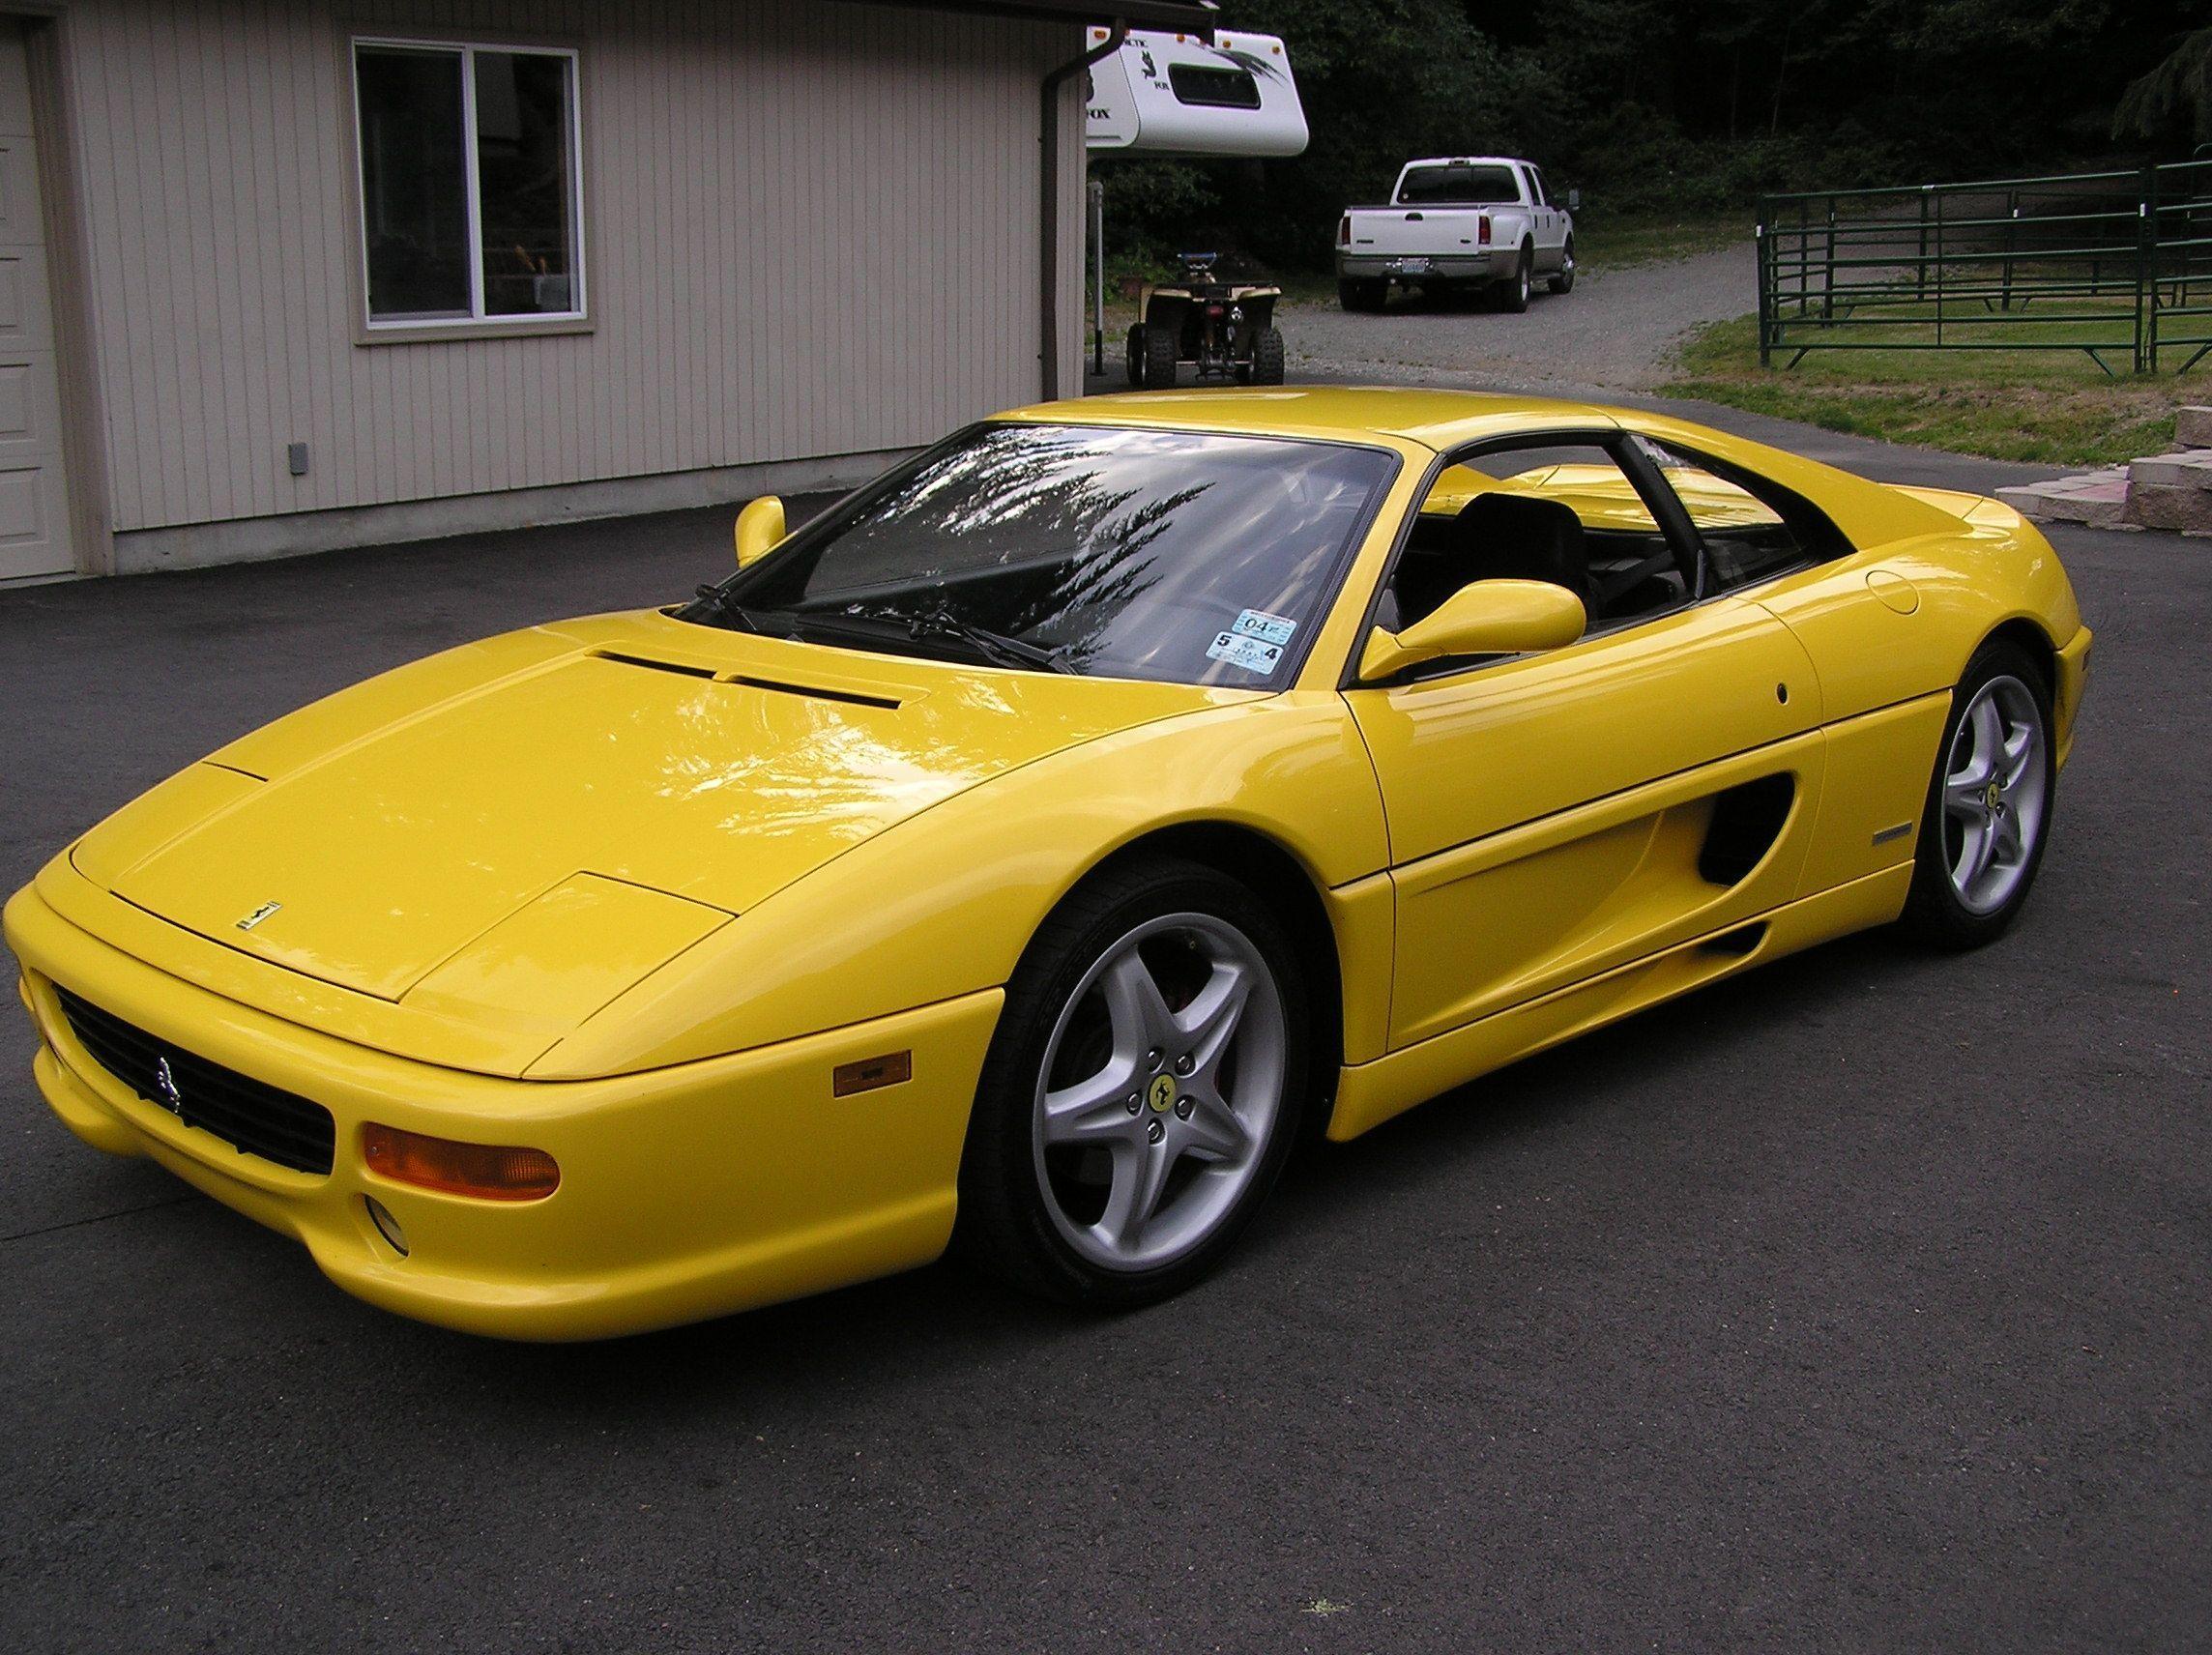 Ferrari F355 Gts F1 Yellow Car Luxurycars Luxury Cars Yellow Car Cars F355 Ferrari Gts Luxury Luxurycars Yellow